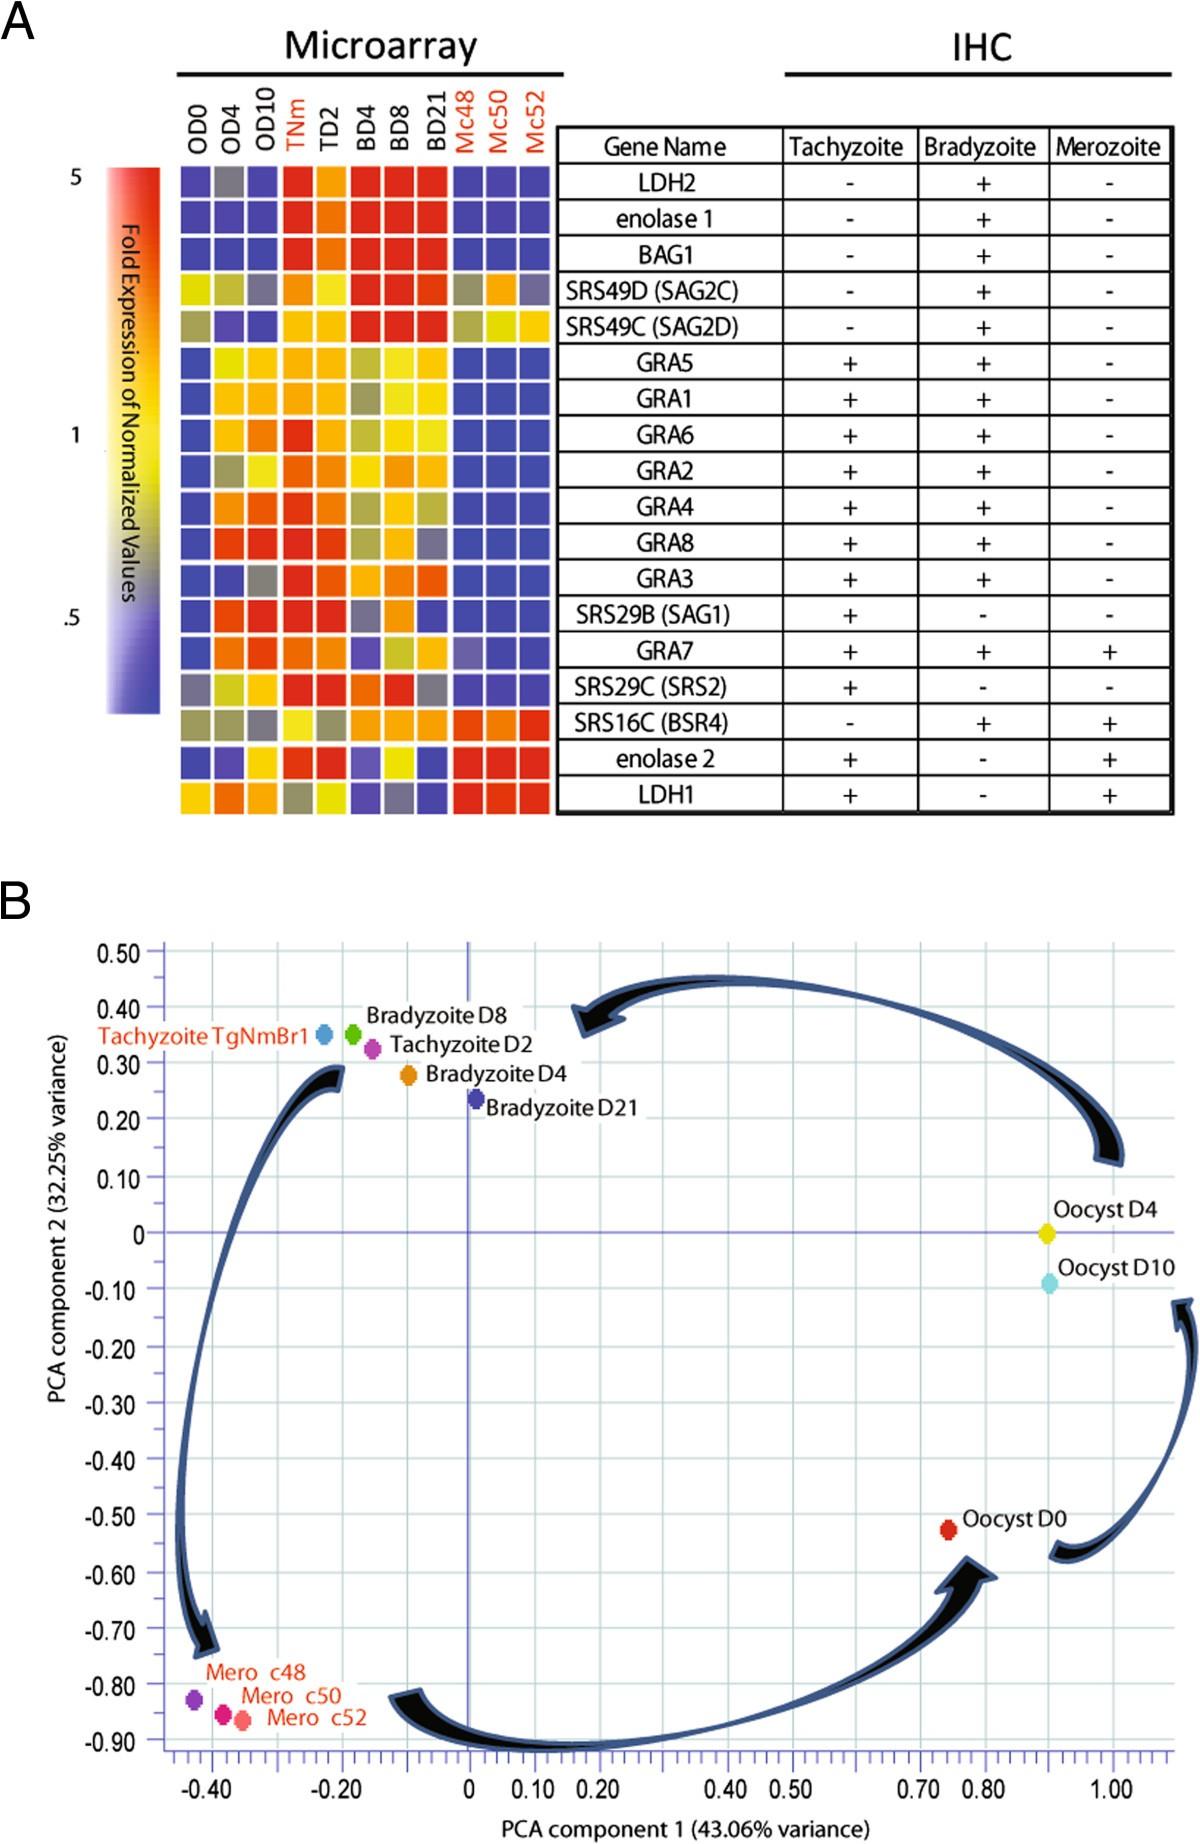 Toxoplasma gondii merozoite gene expression analysis with